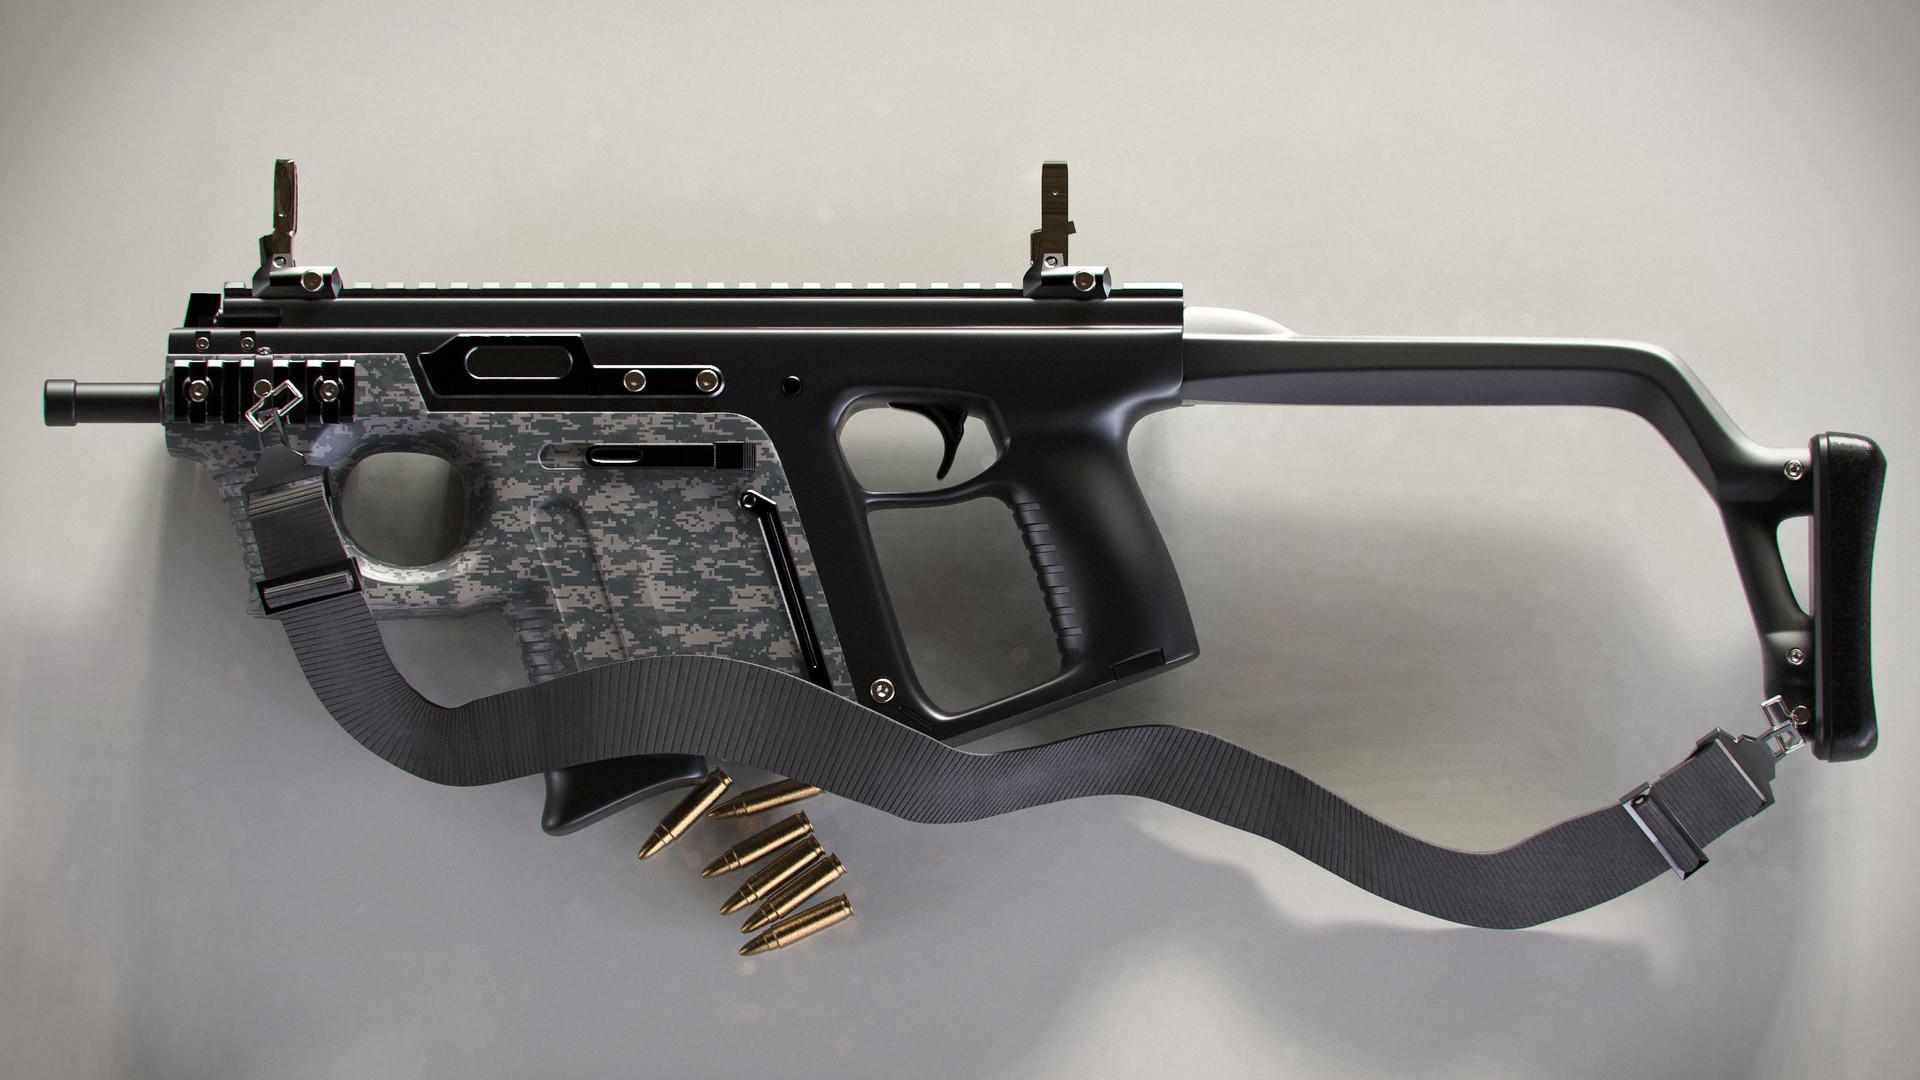 ian-mcdonell-gun-scene-4-3-edit.jpg